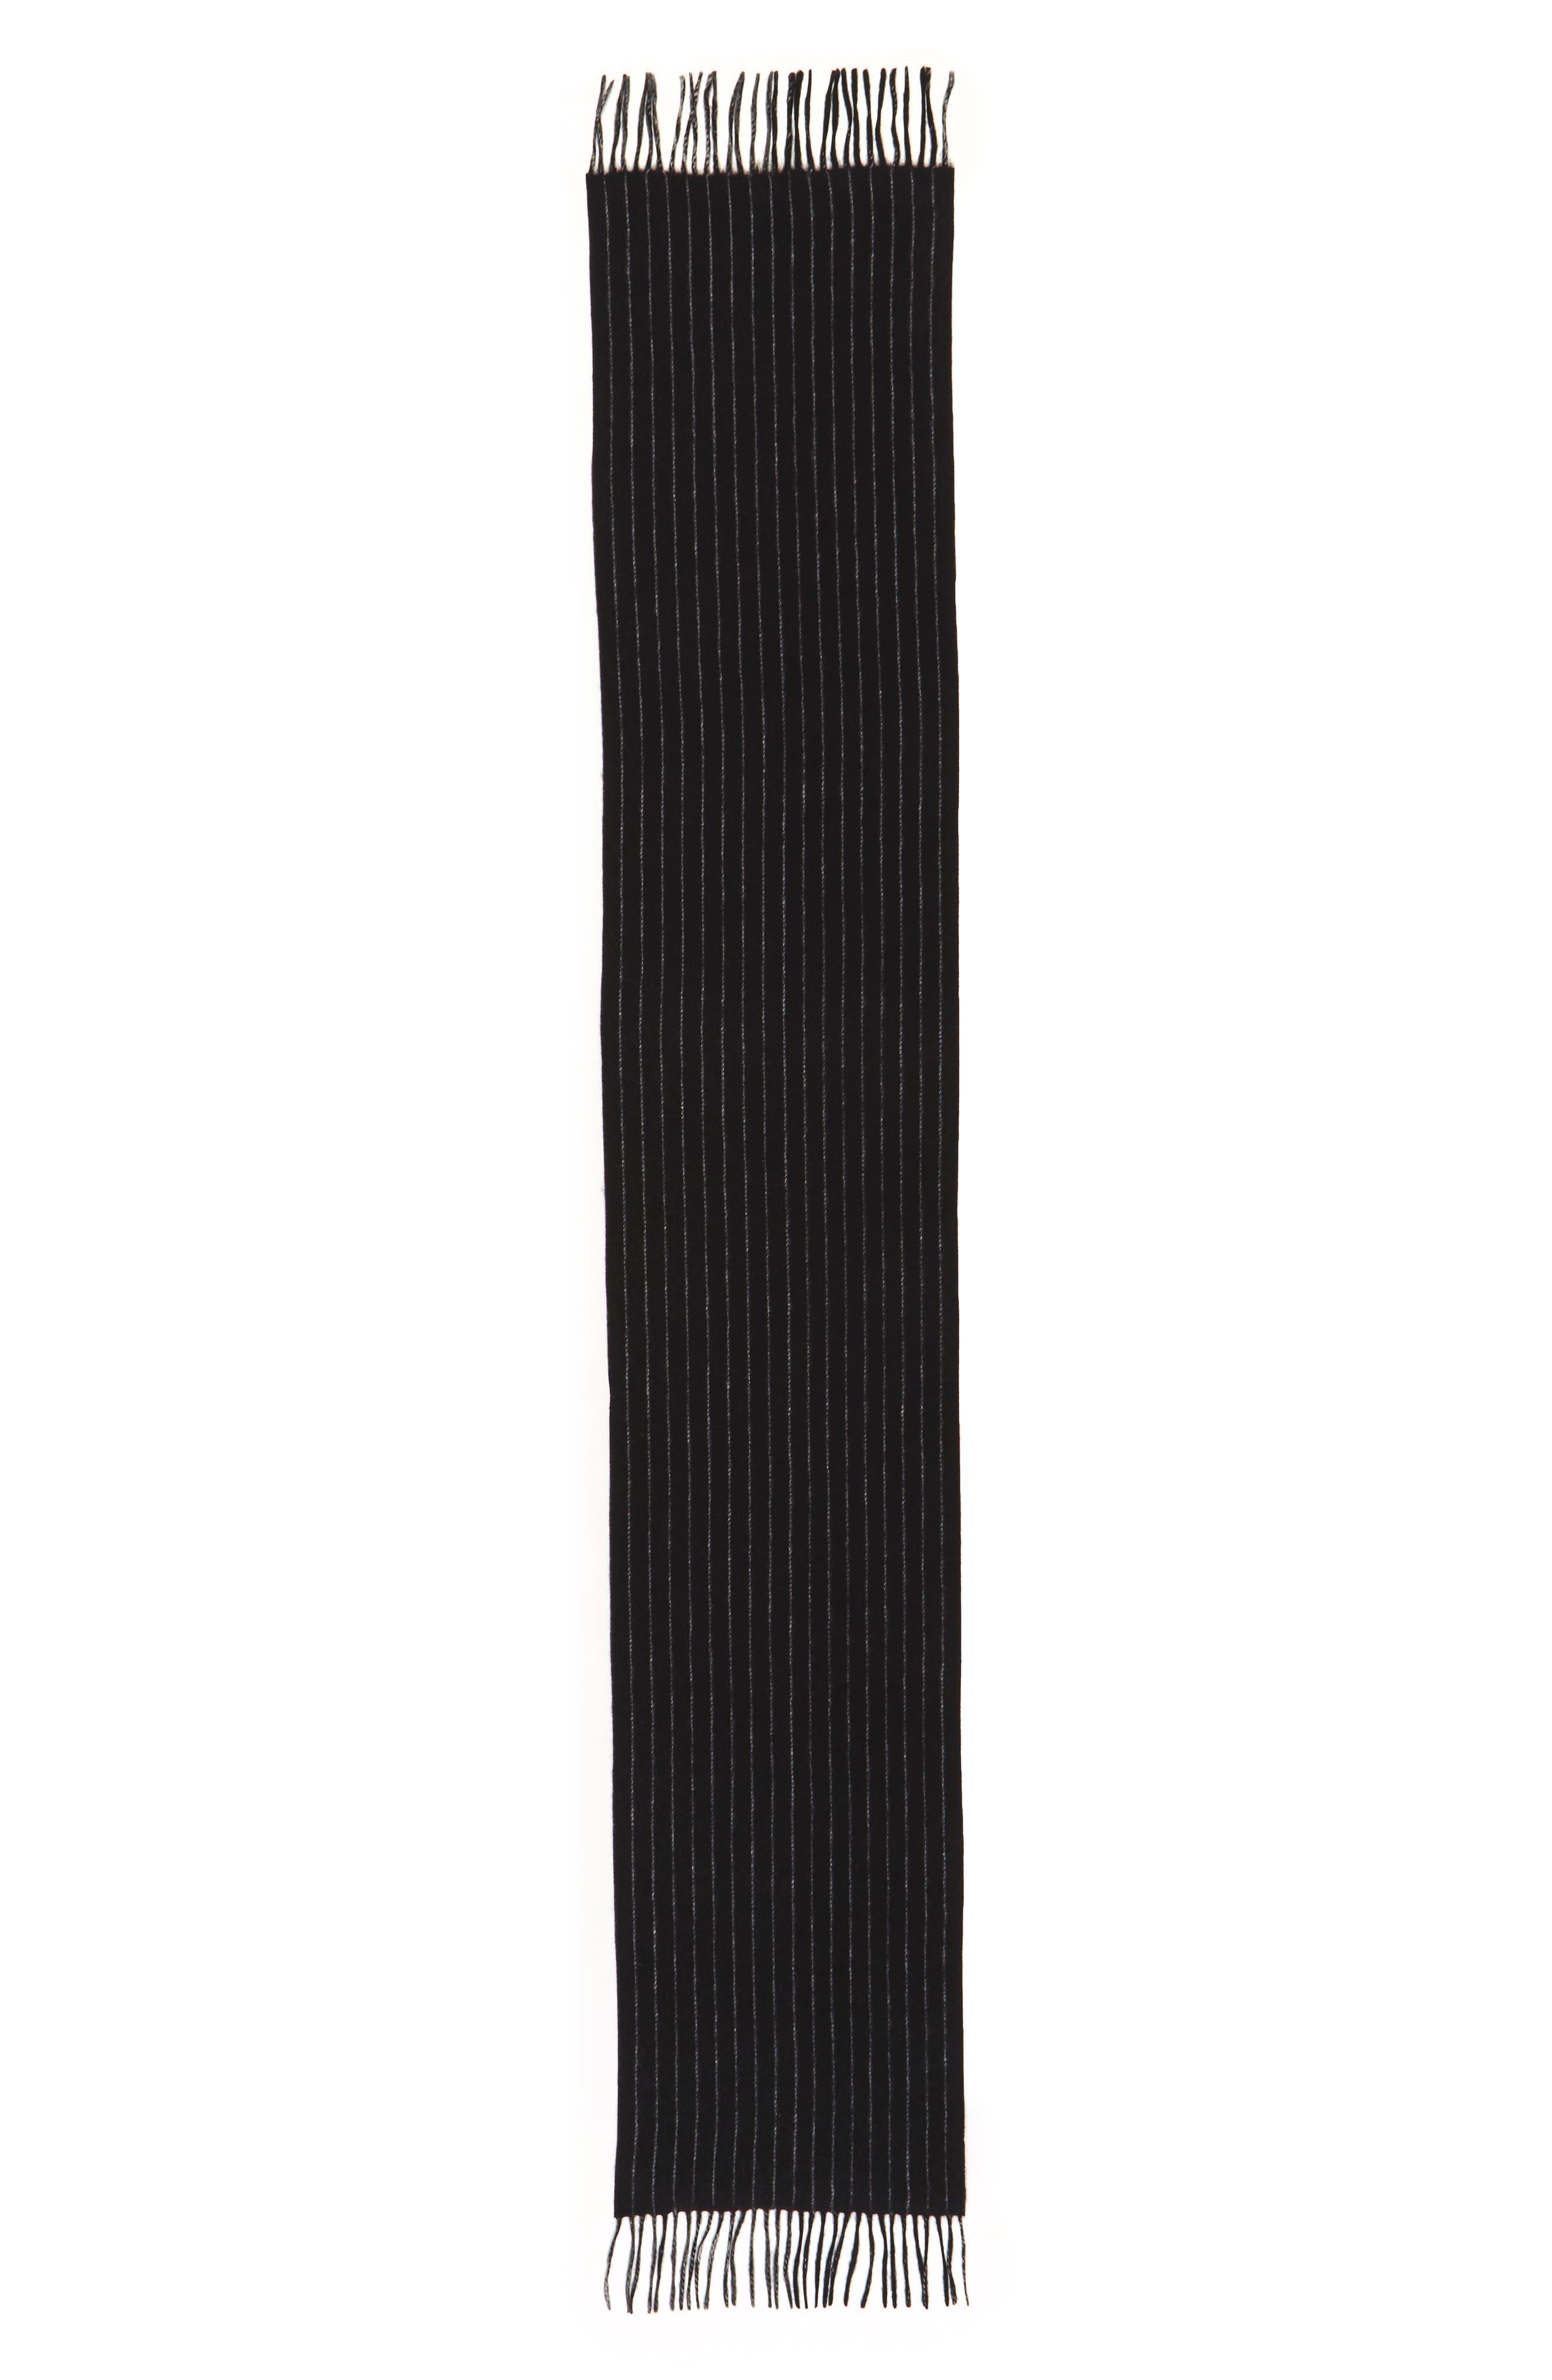 Pinstripe Cashmere Scarf,                             Alternate thumbnail 2, color,                             Black/ Grey